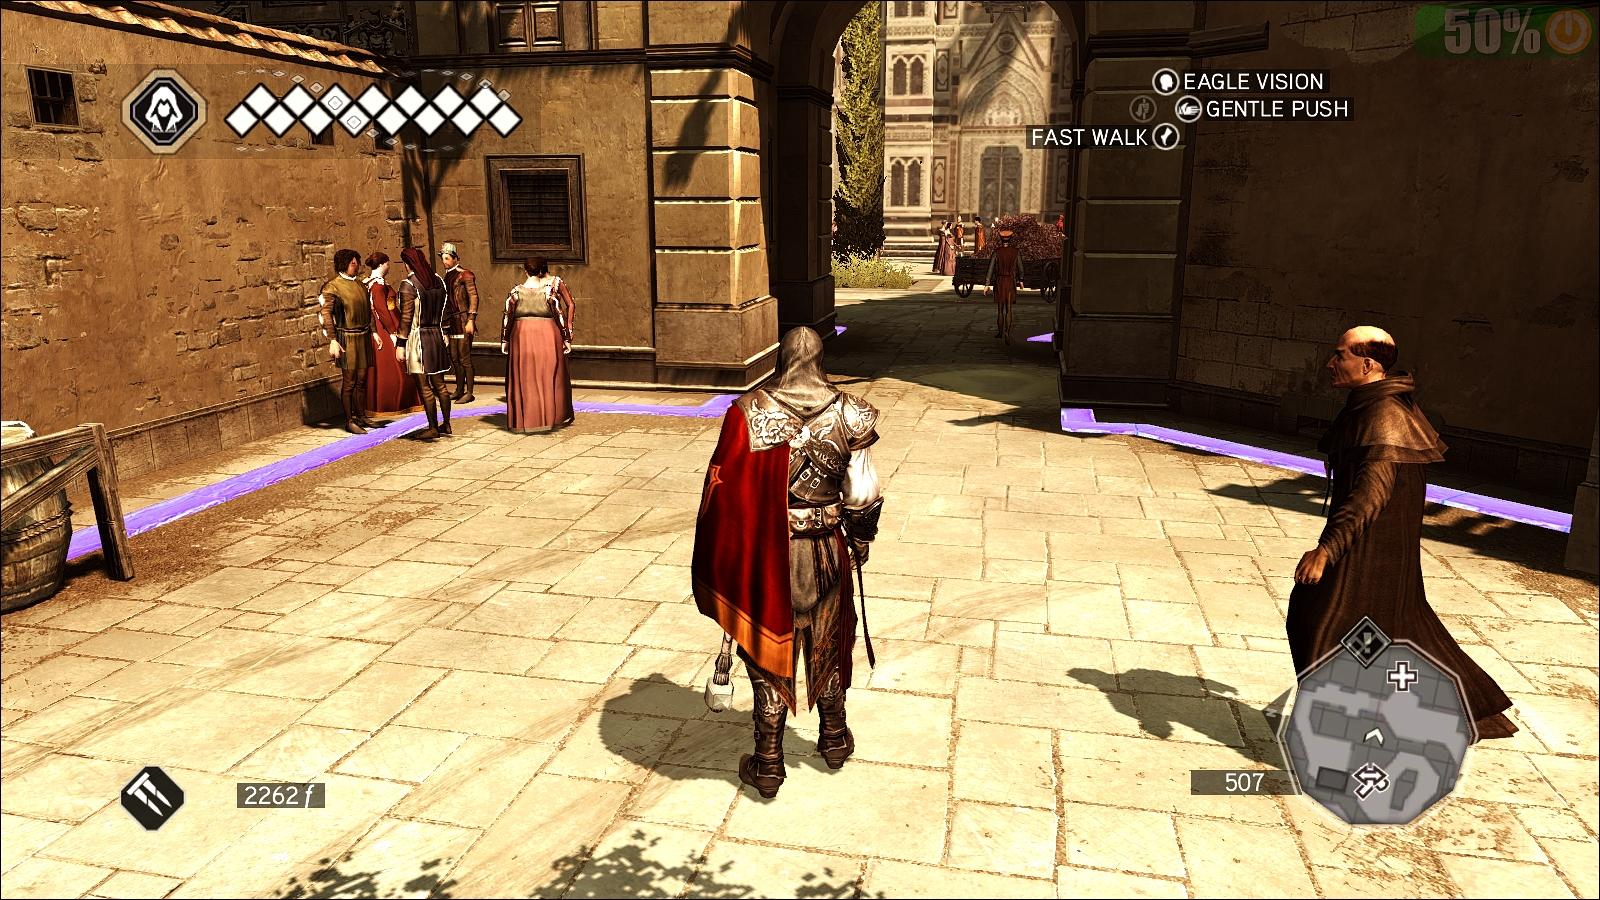 AssassinsCreedIIGame.exe_DX9_20140211_163758.jpg